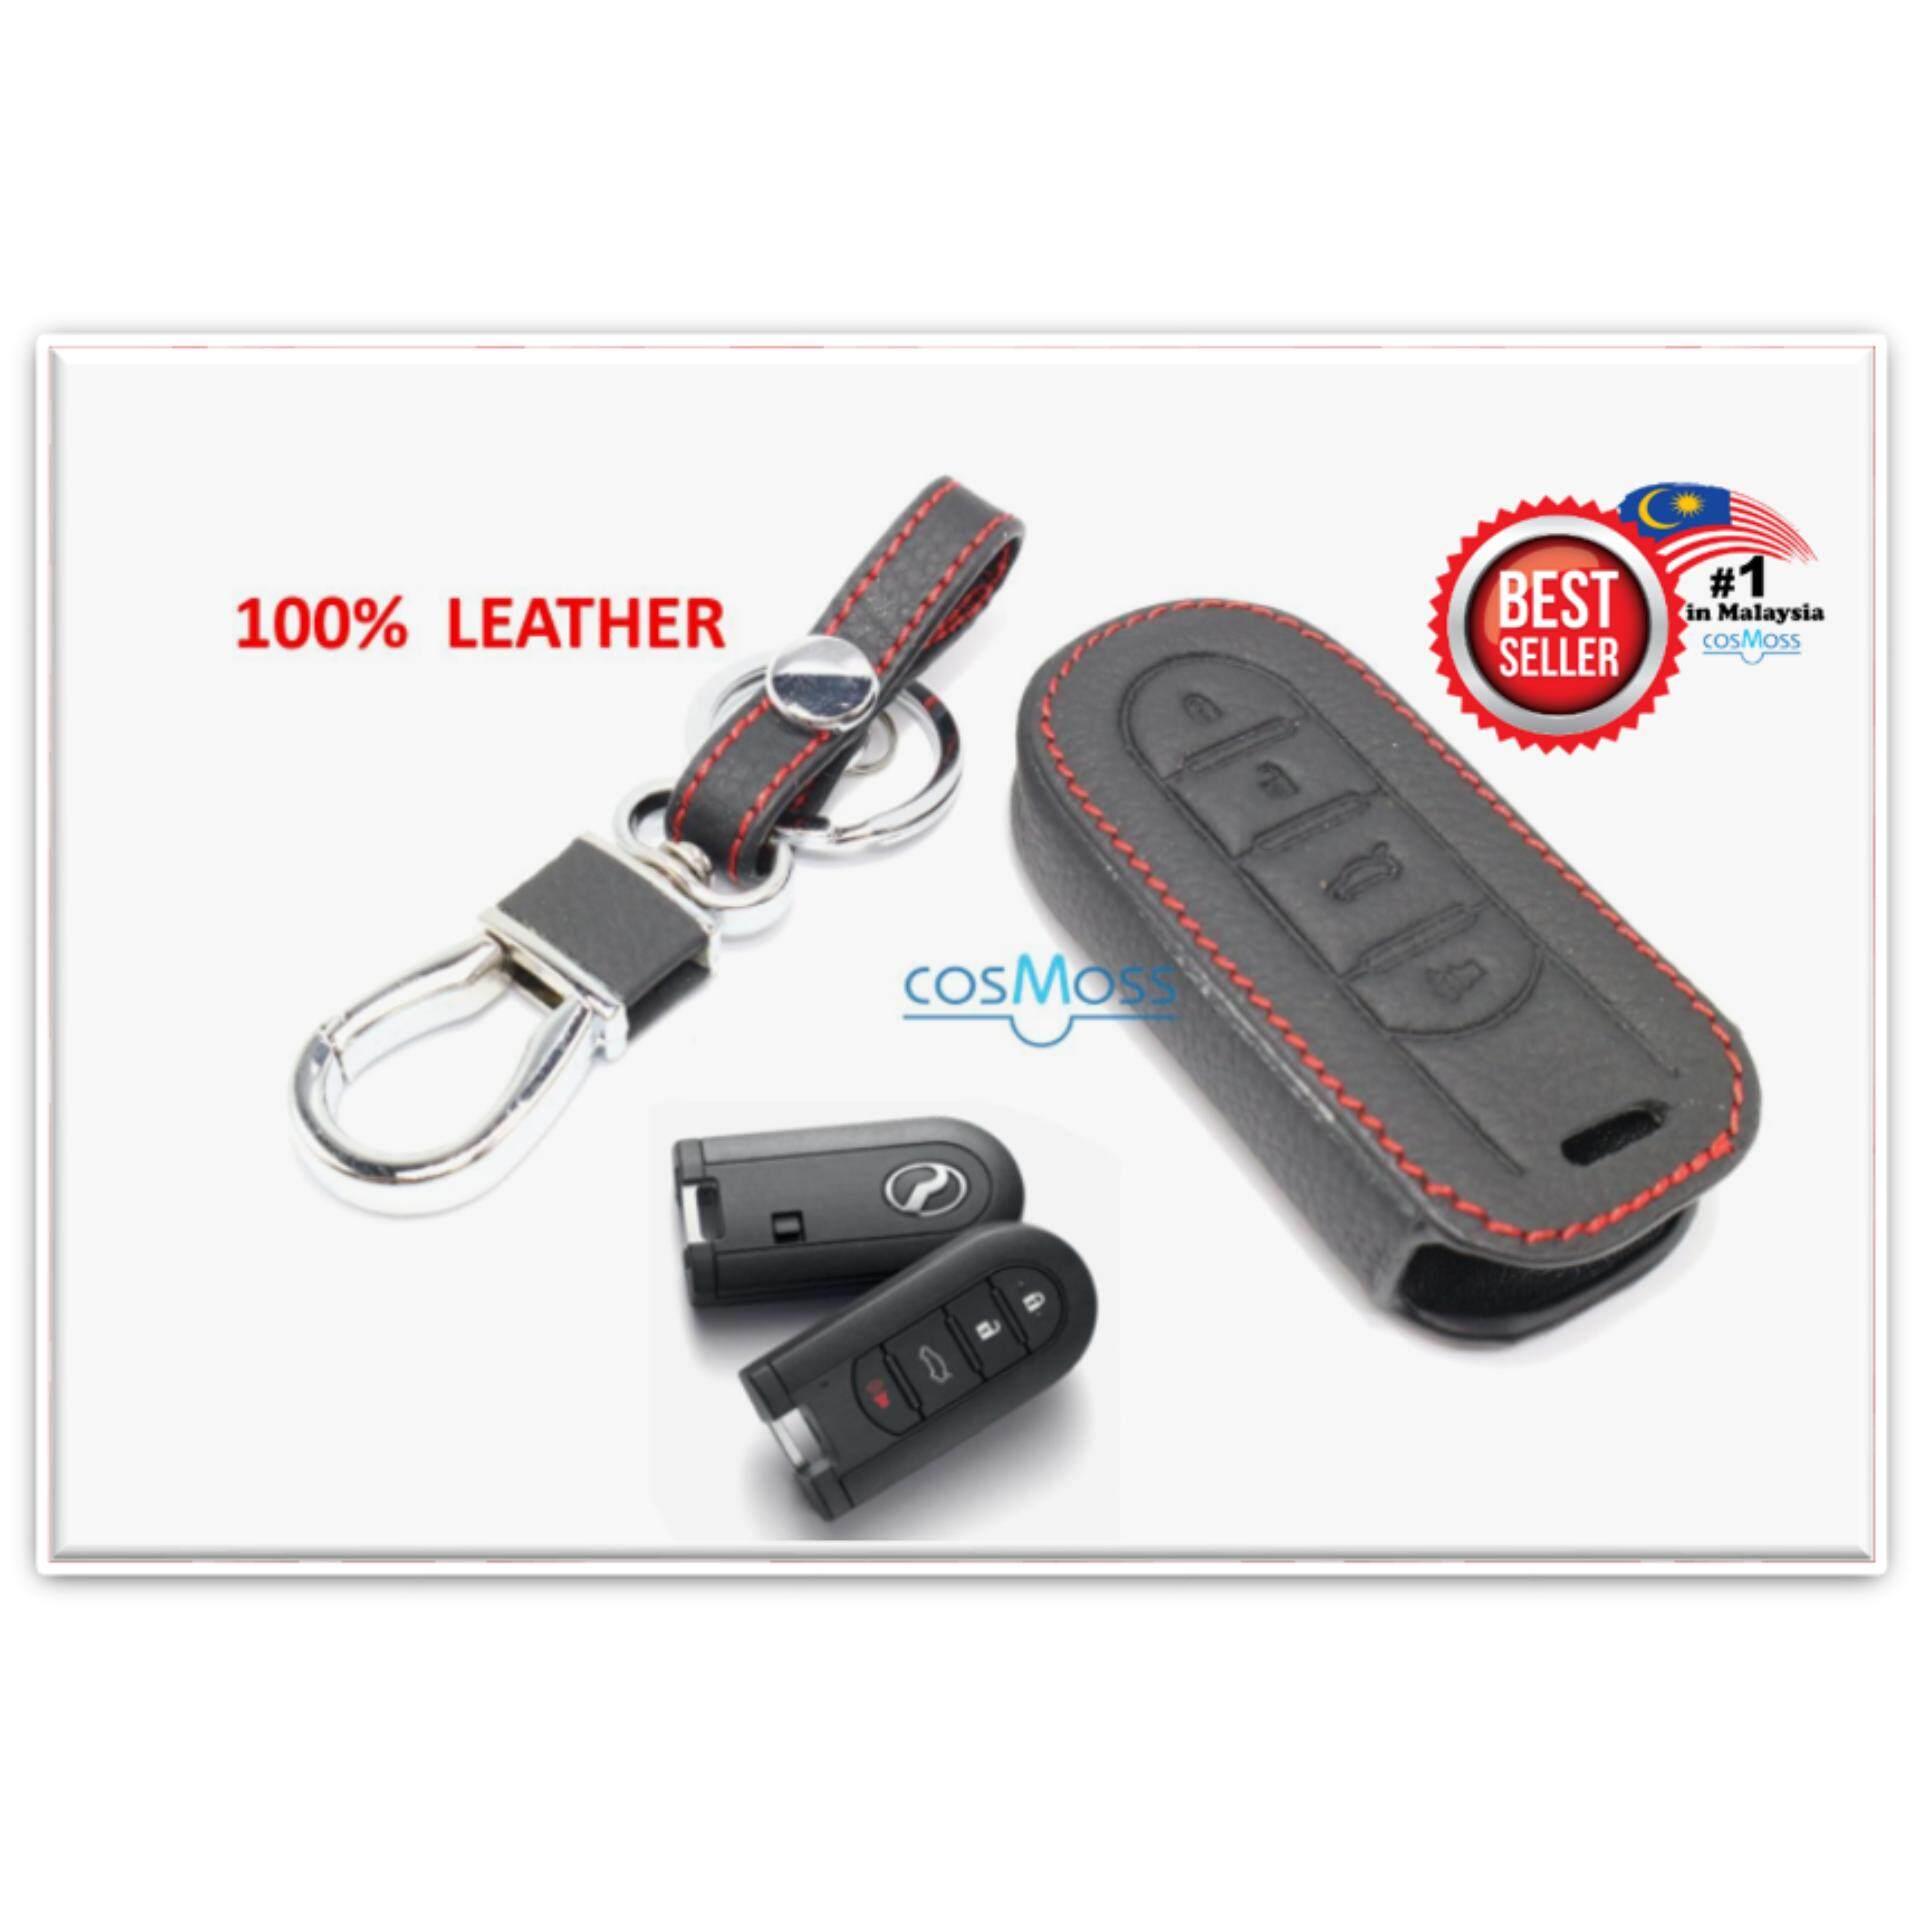 Perodua Aruz Keyless Remote Leather Car Key Cover Case (black-Redline) By Cosmoss.